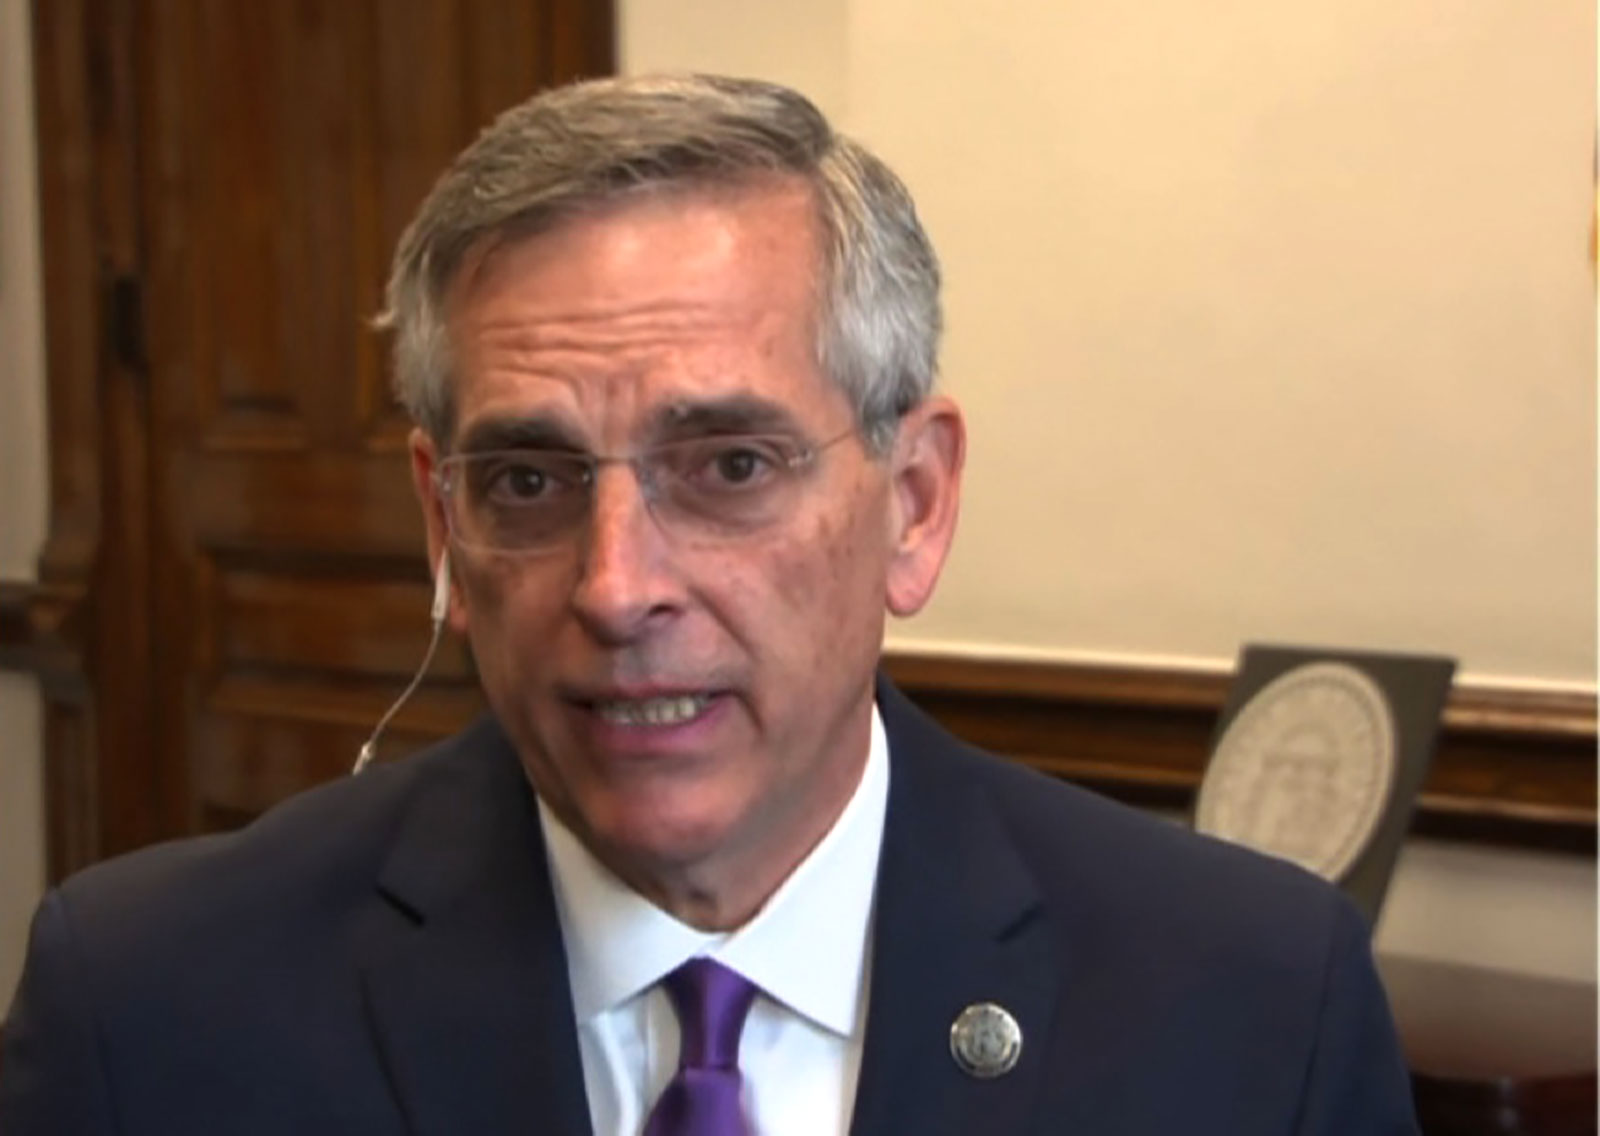 Georgia's Secretary of State Brad Raffensperger speaks with CNN on November 4.